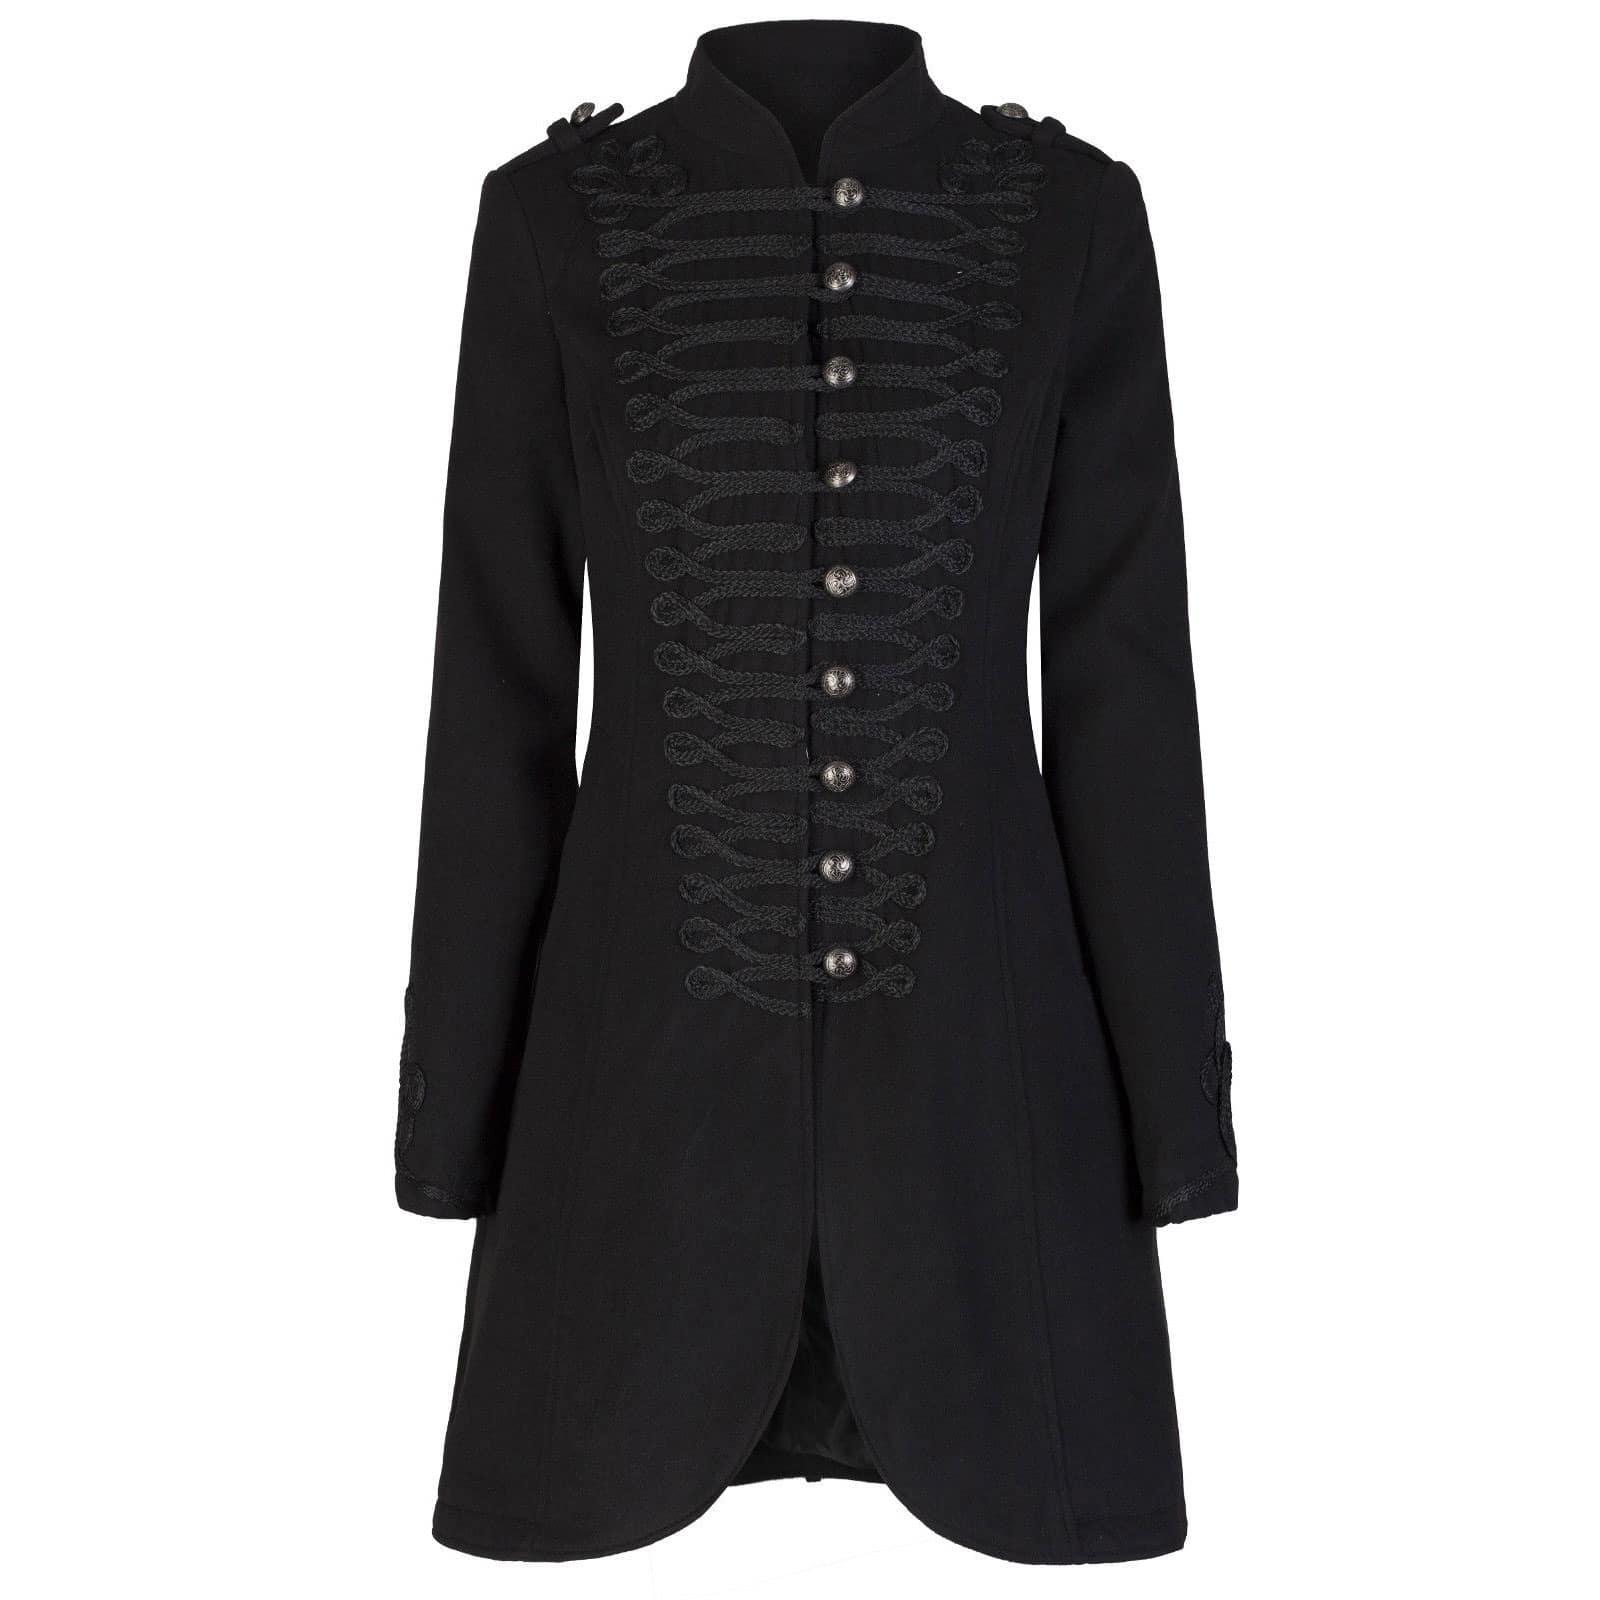 47c5e4d66 Ladies Black Military Gothic Style Braided Wool Effect Coat Jacket